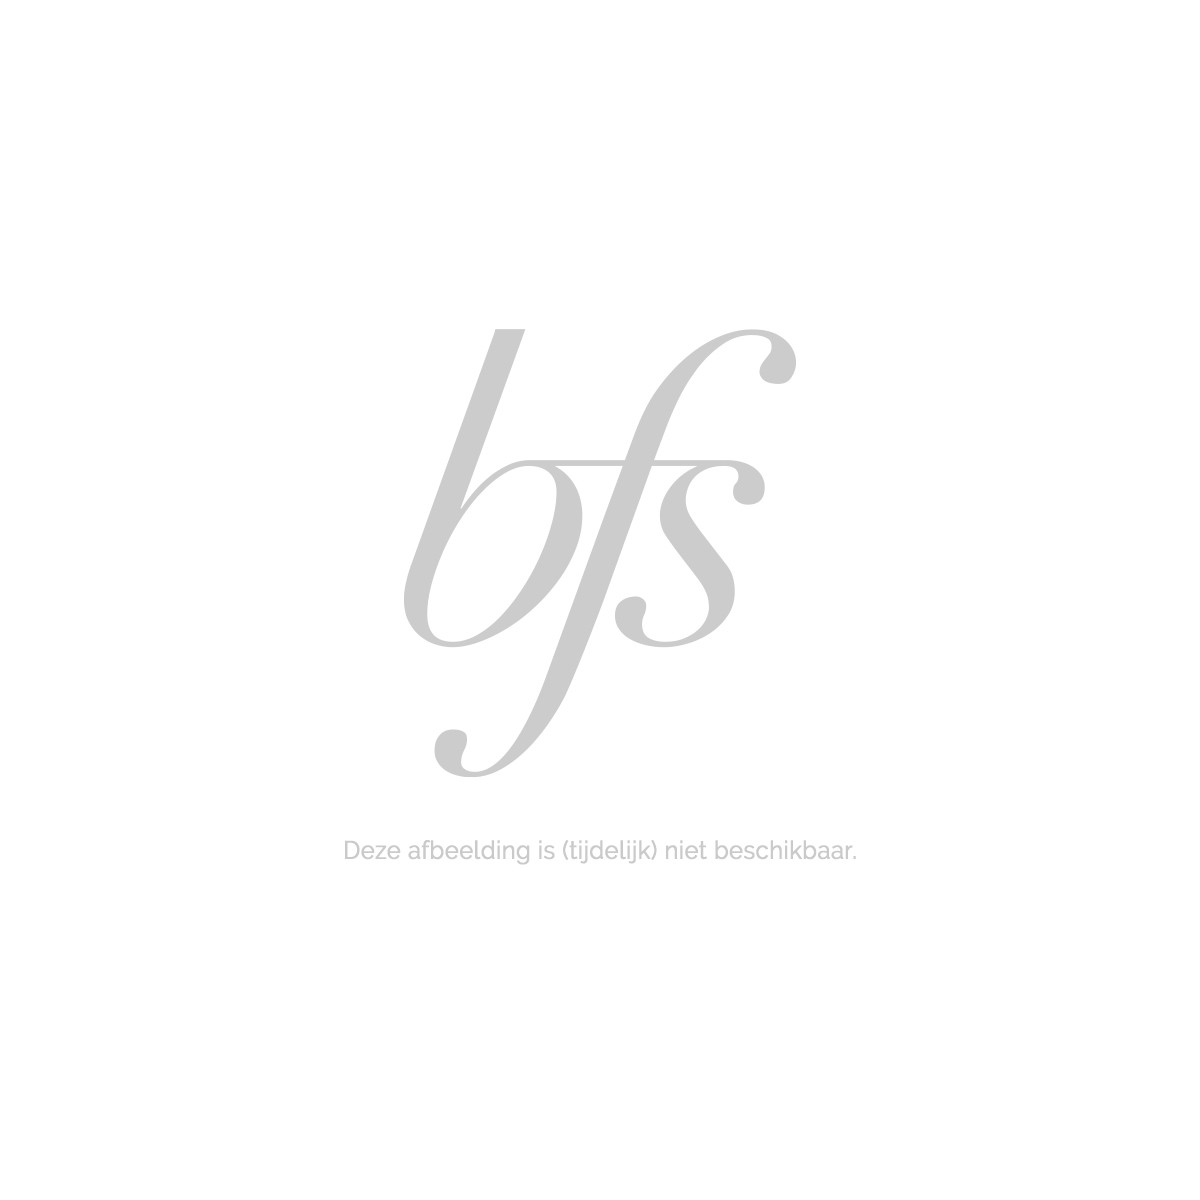 Christian Dior Capture Totale Serum Foundation 30 Ml